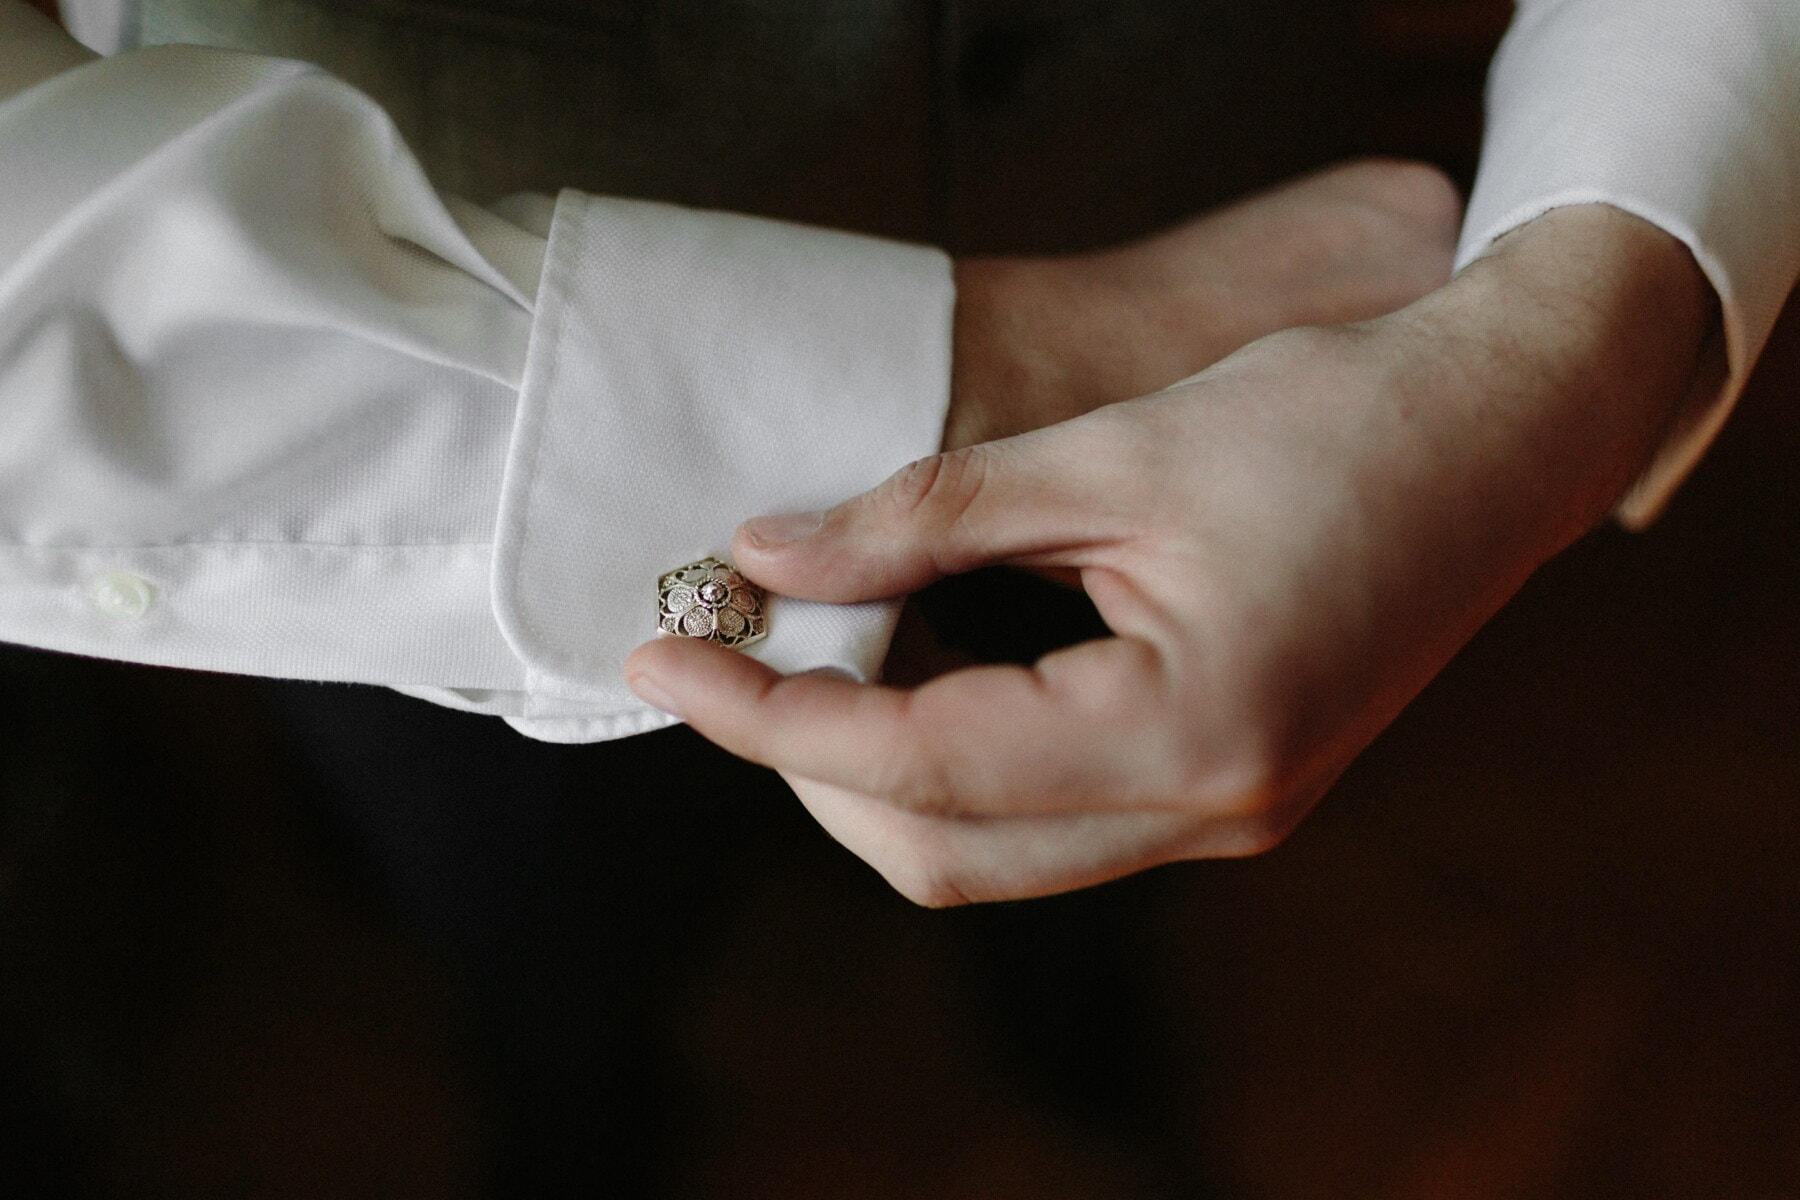 cuff, sleeve, white shirt, button, luxury, jewelry, fashion, hands, man, hand